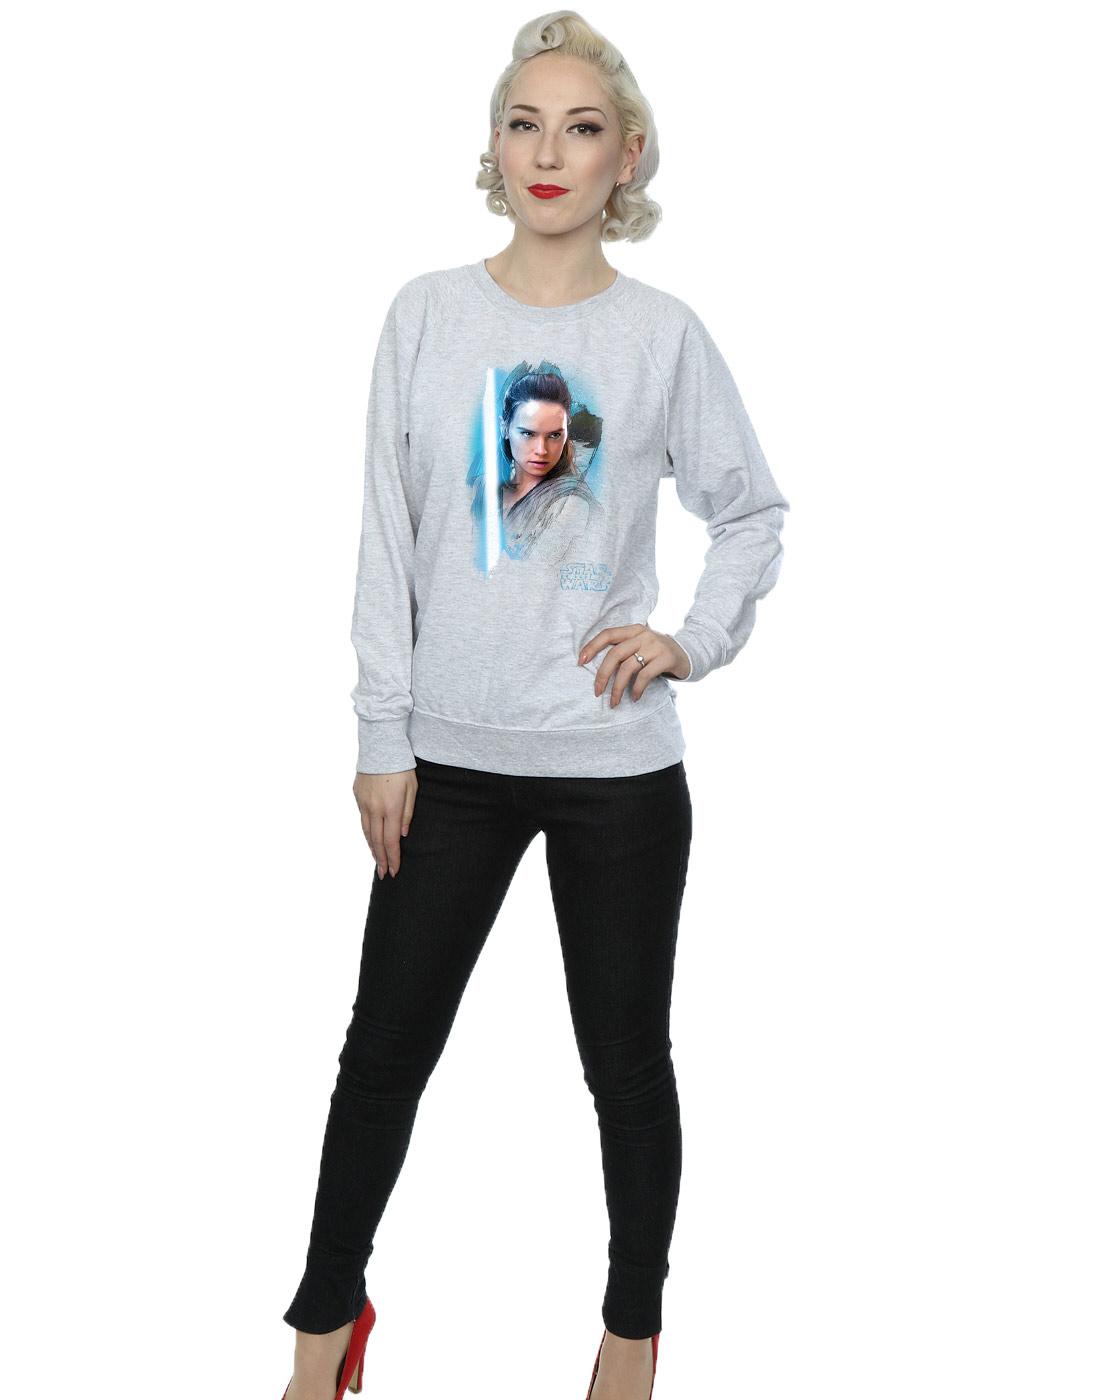 Star Wars Women/'s The Last Jedi Rey Brushed Sweatshirt